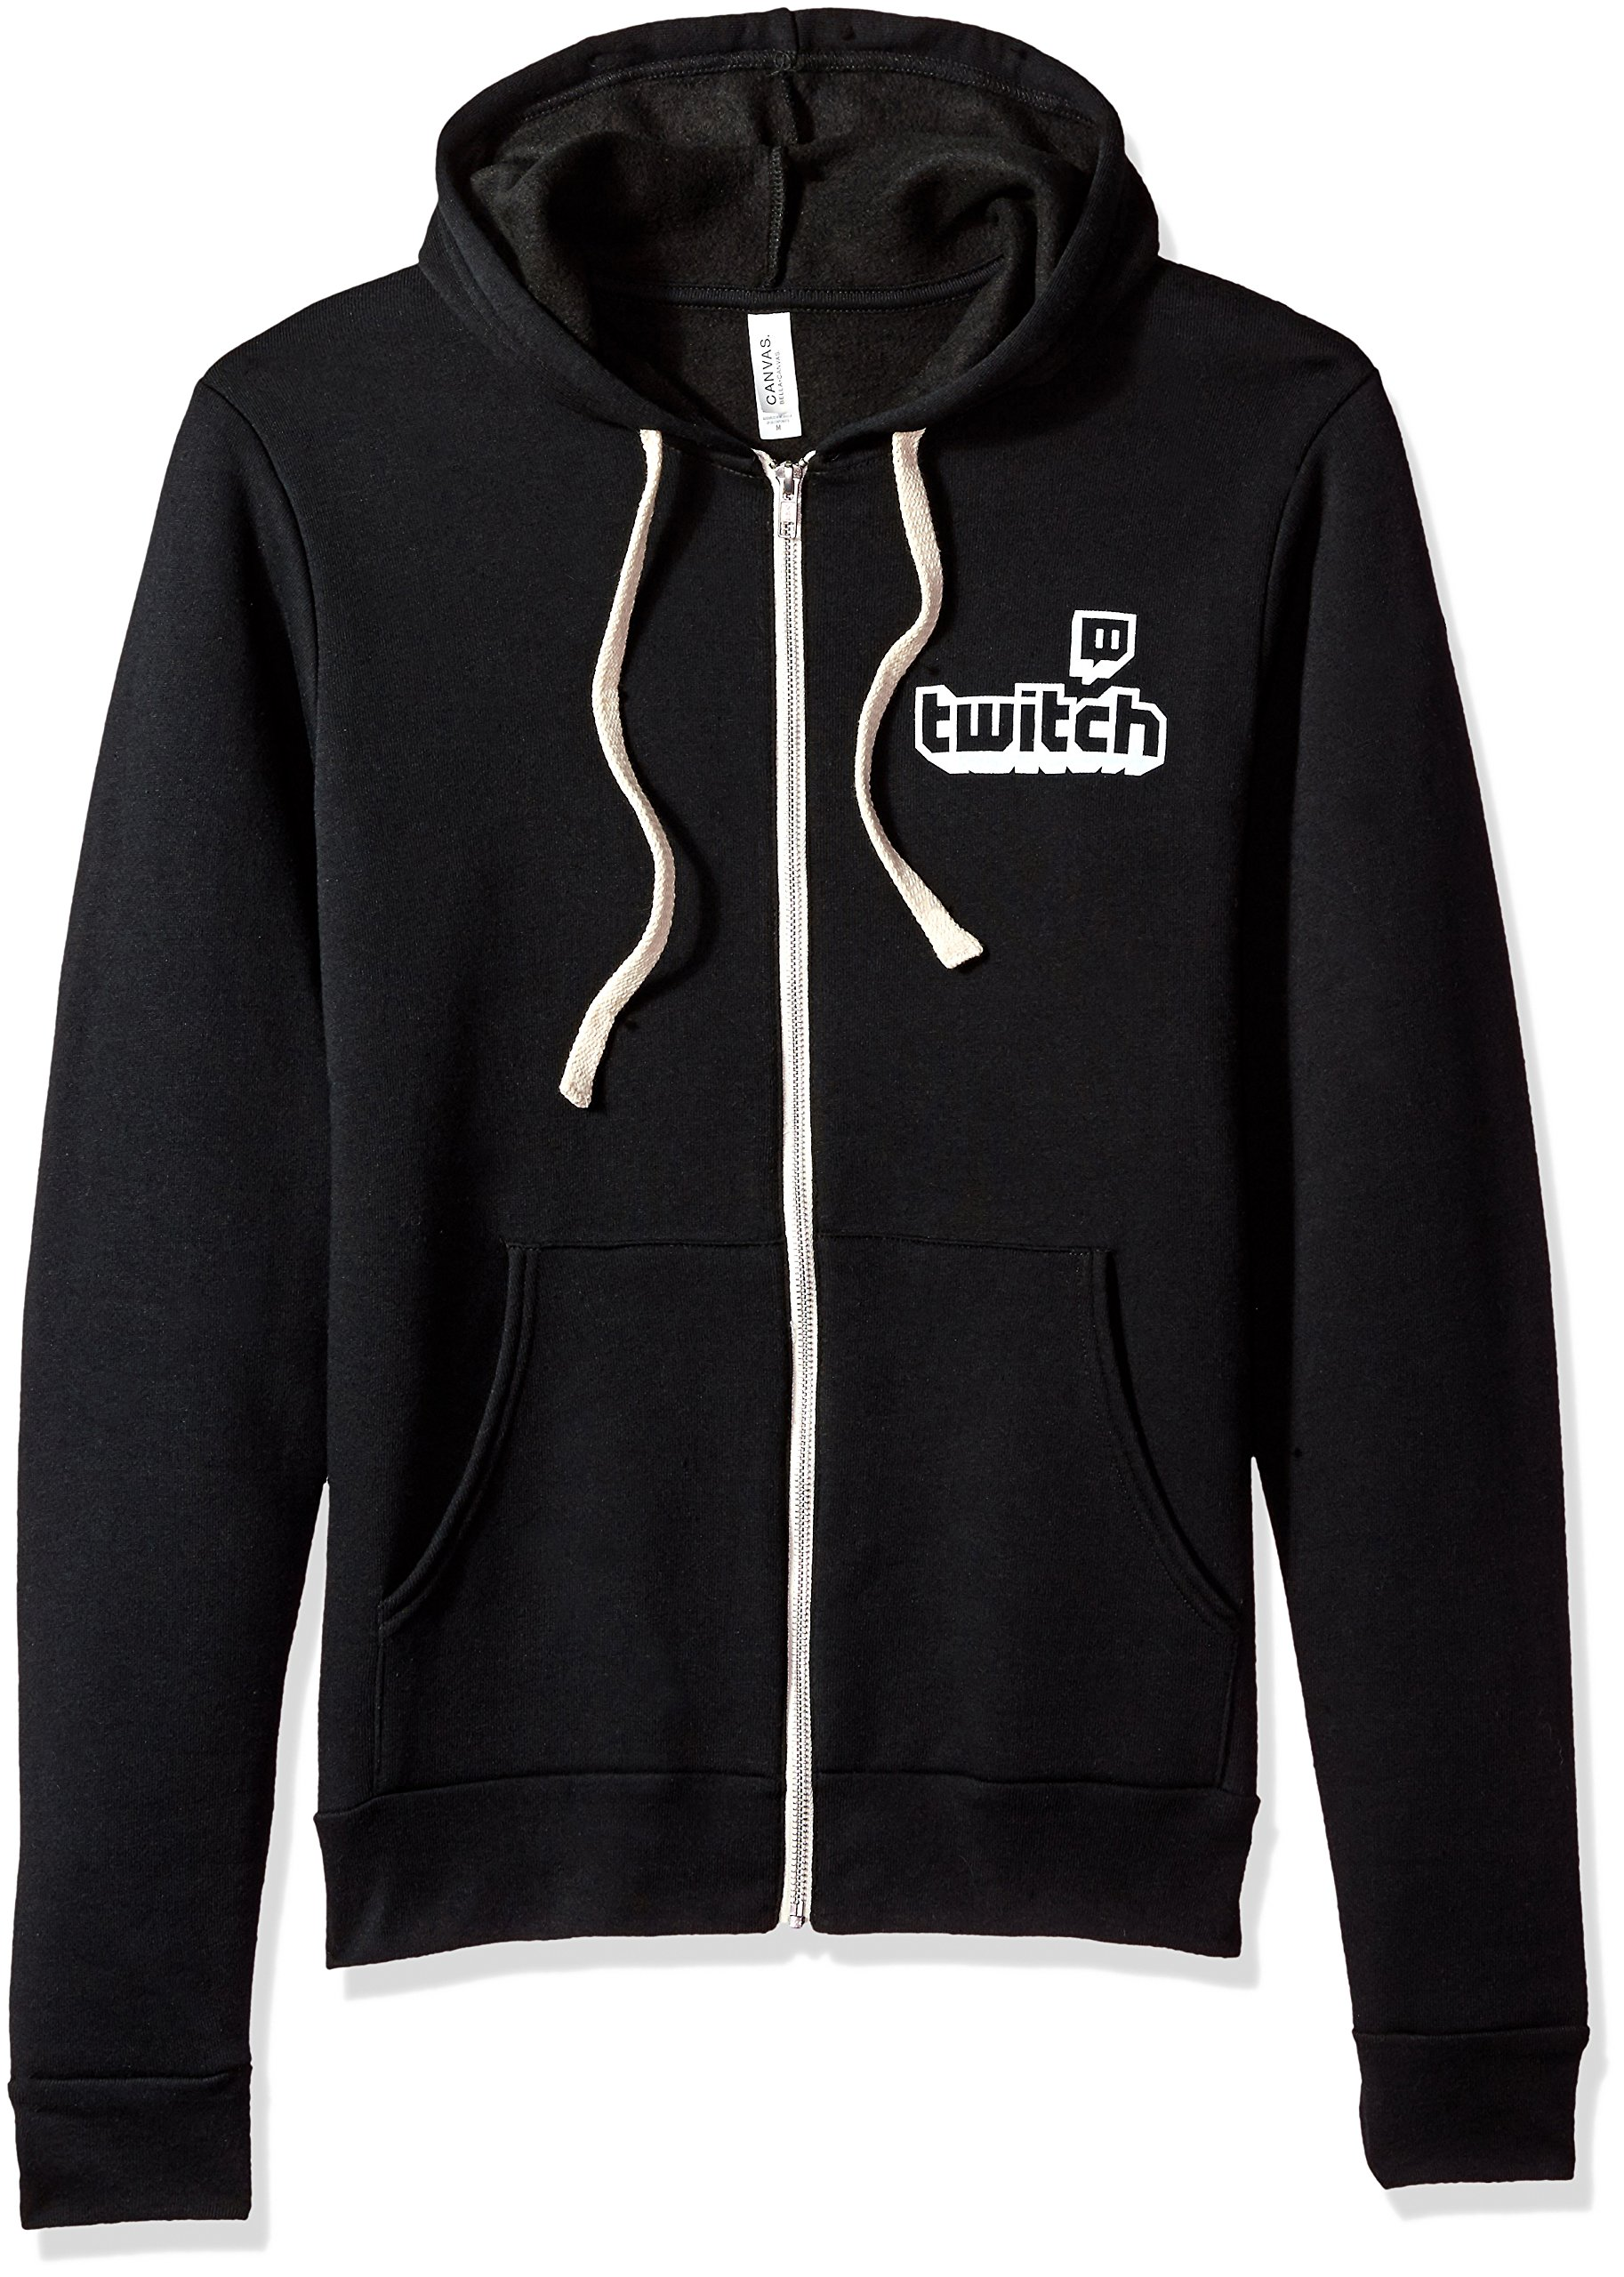 Twitch Logo Unisex Full Zip Hoodie (Large, Black)